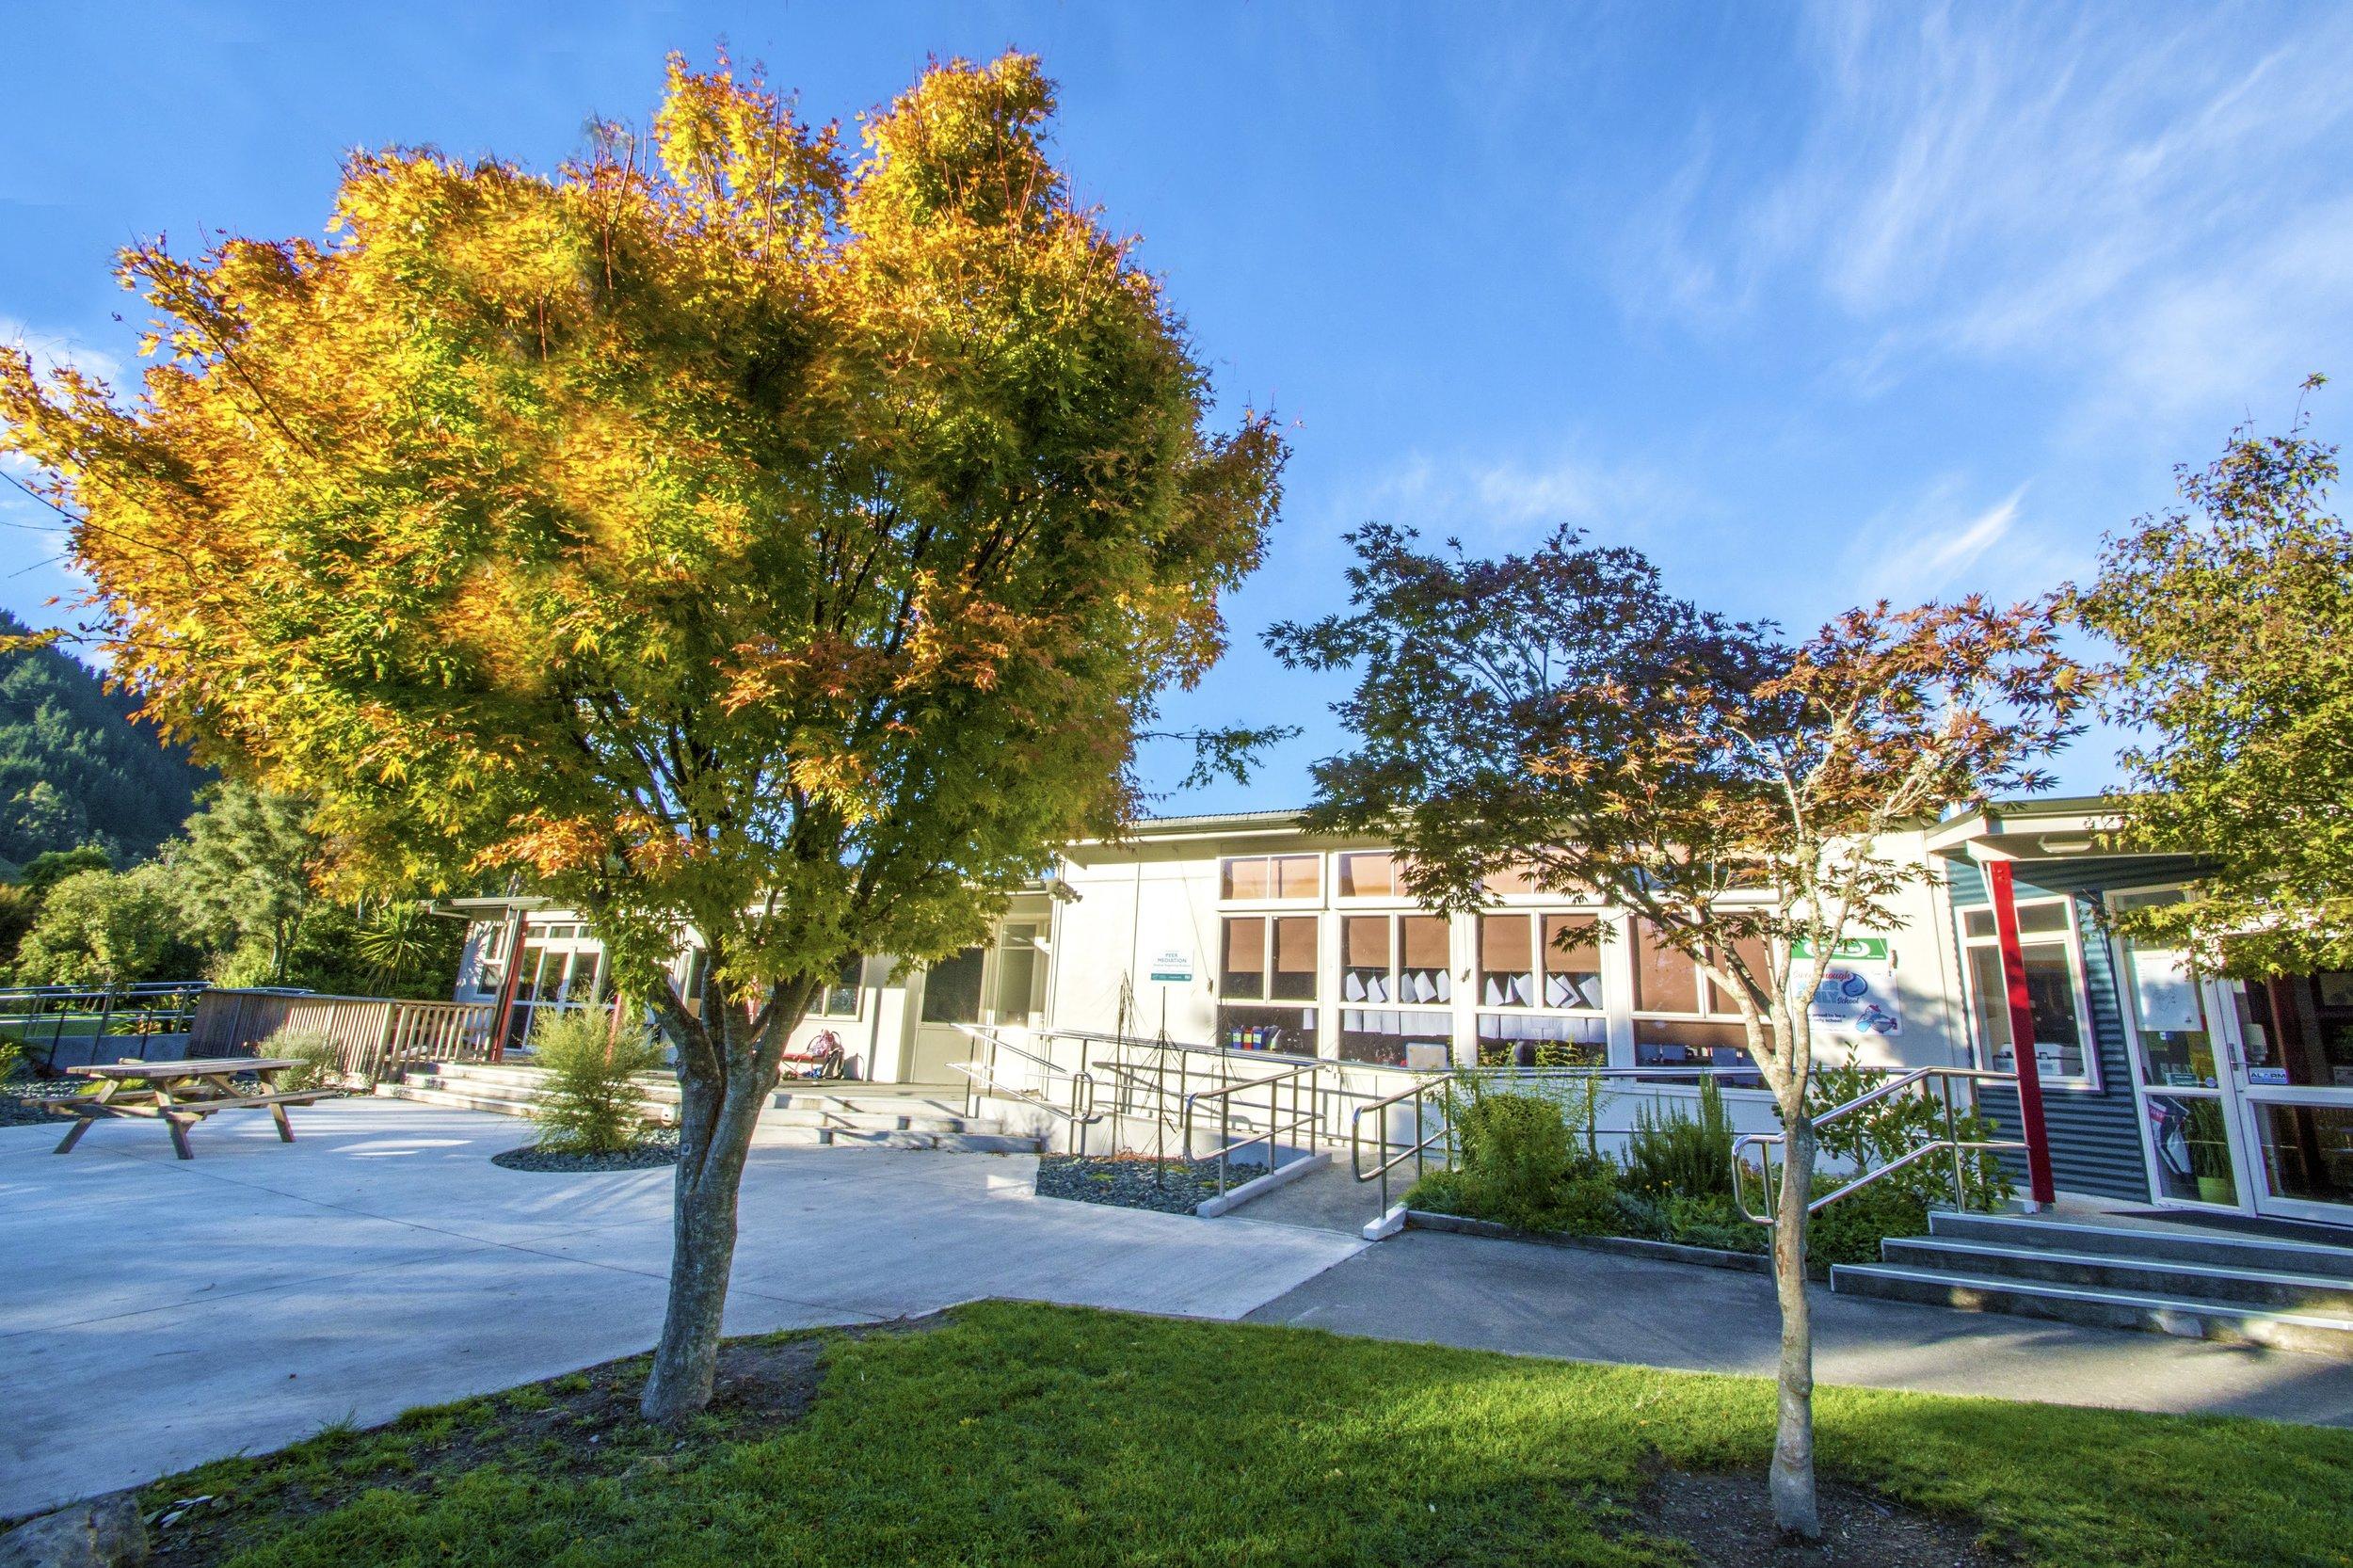 hira school frontage